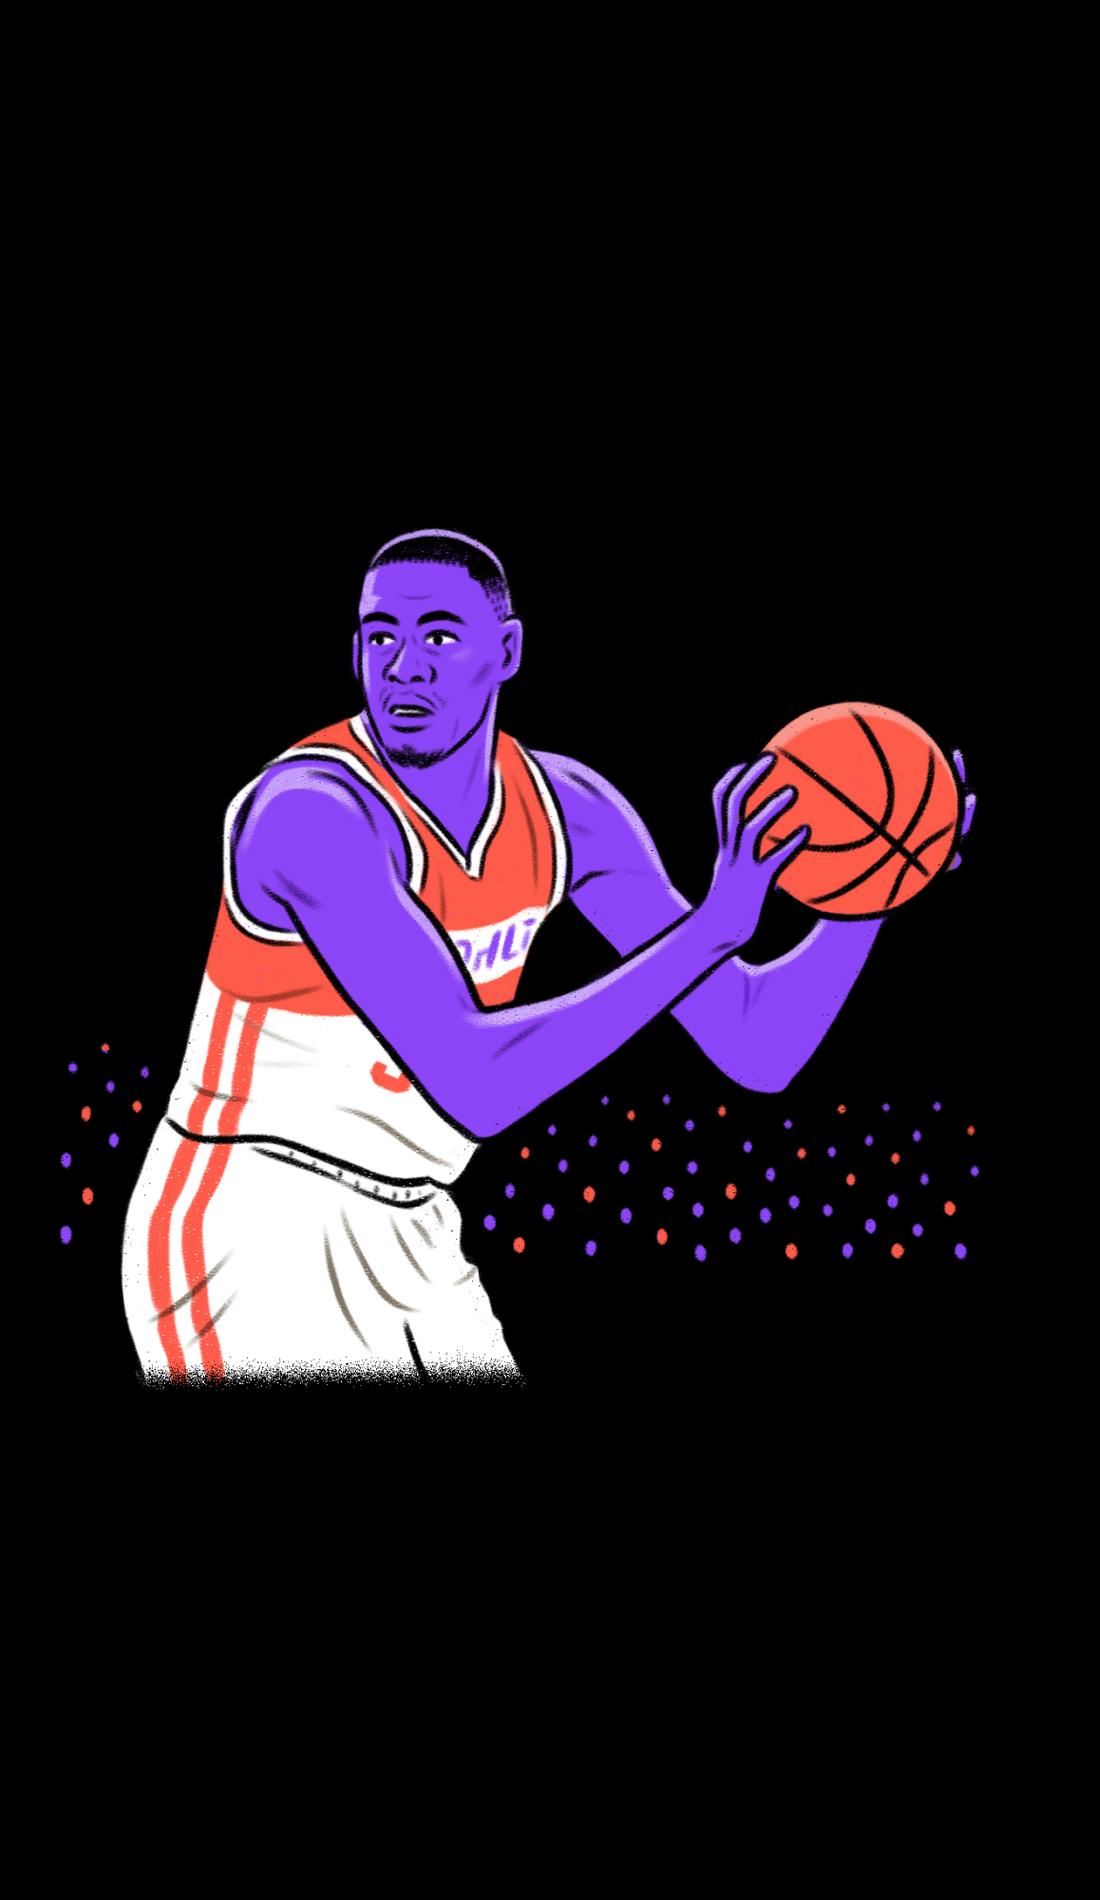 A South Florida Bulls Basketball live event